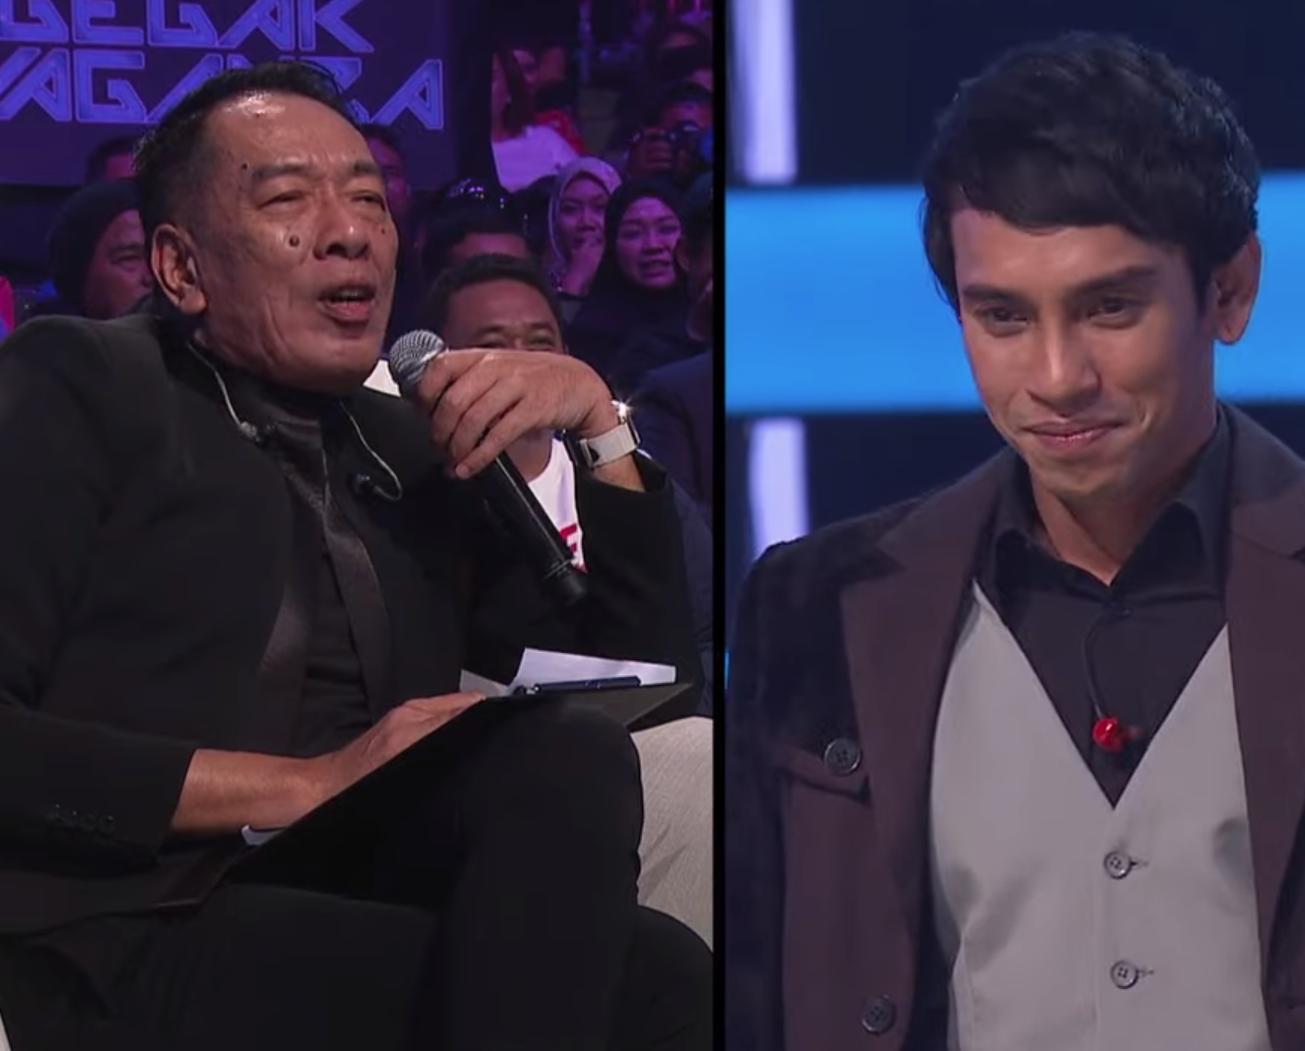 [VIDEO] Kembali Popular Lepas Sertai GV, Naqiu Dedah Respon Lucu Dari Anaknya